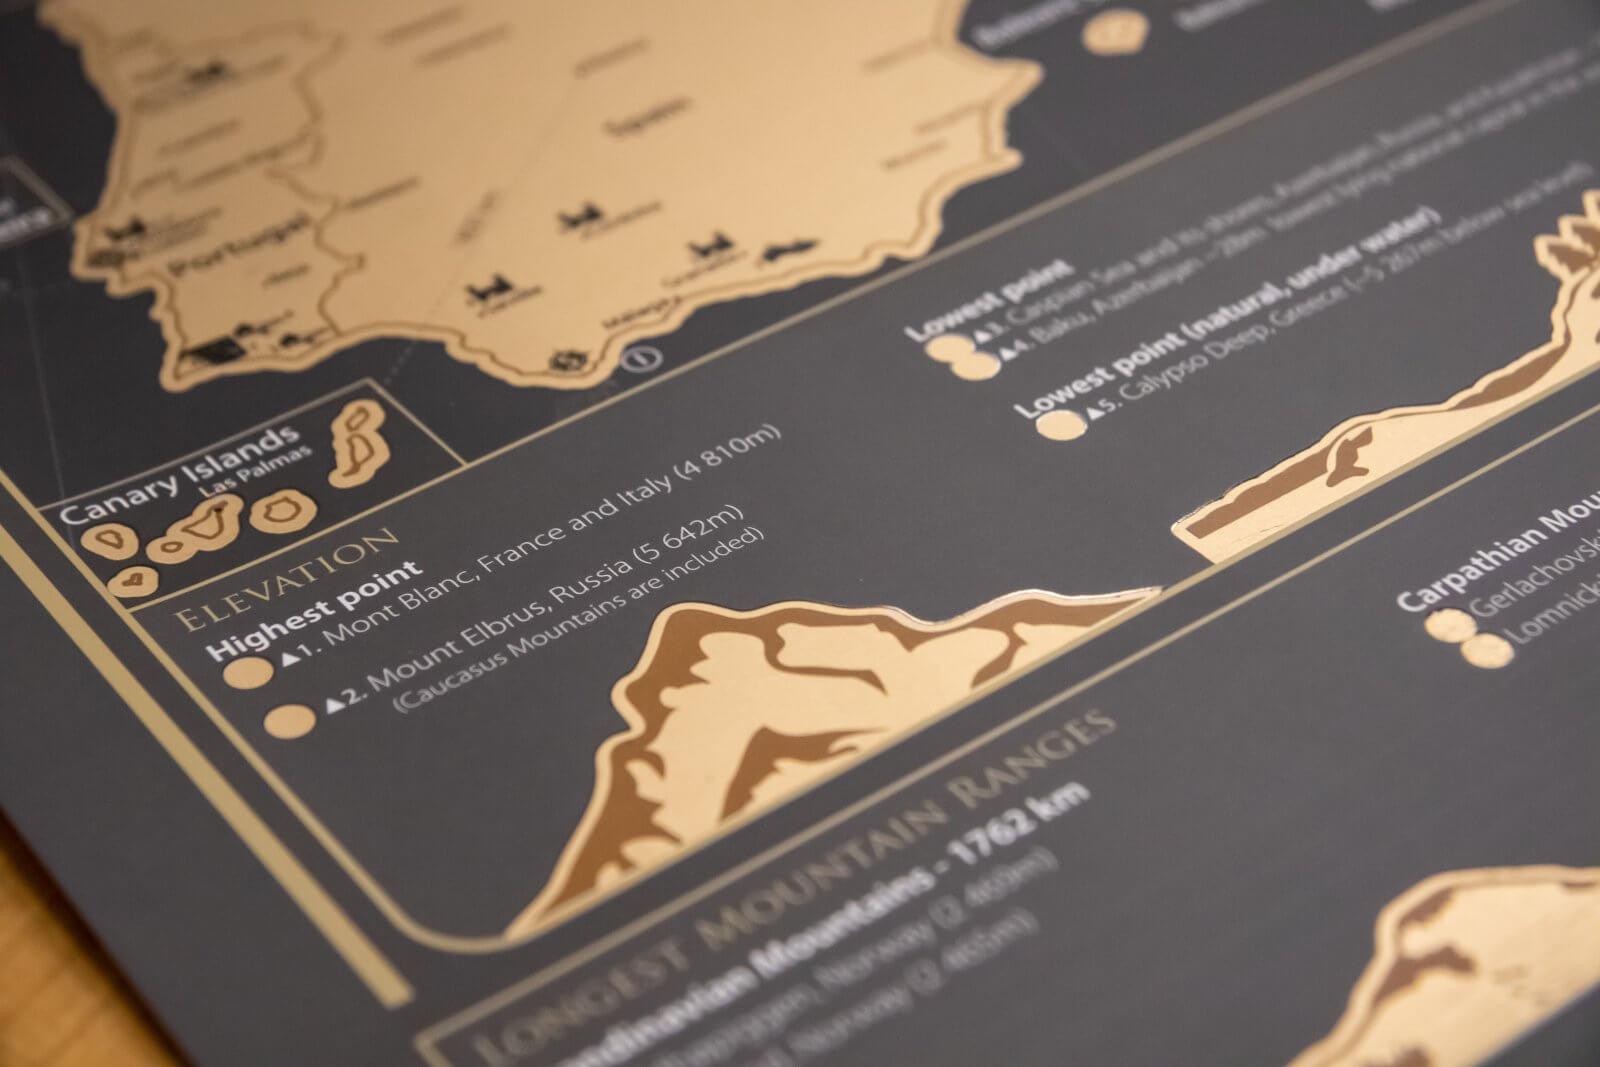 Rubbelkarte Europa - Detailansicht Gebirge